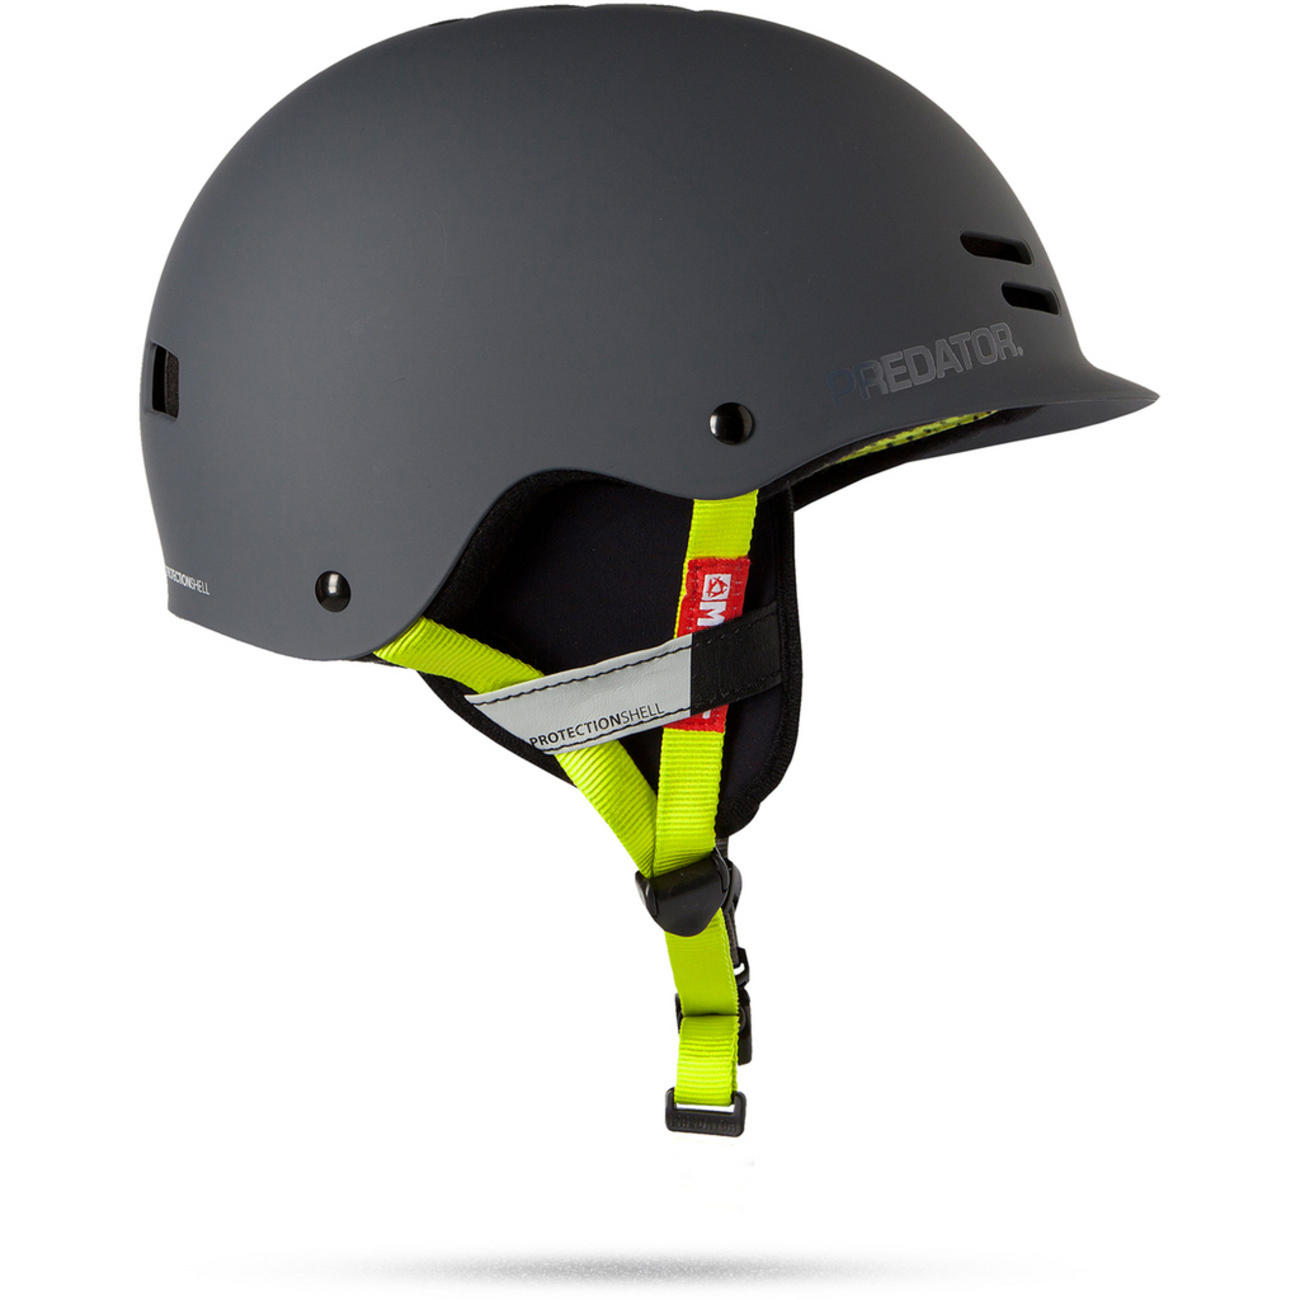 Predator Helmet イヤーパッド付きヘルメット